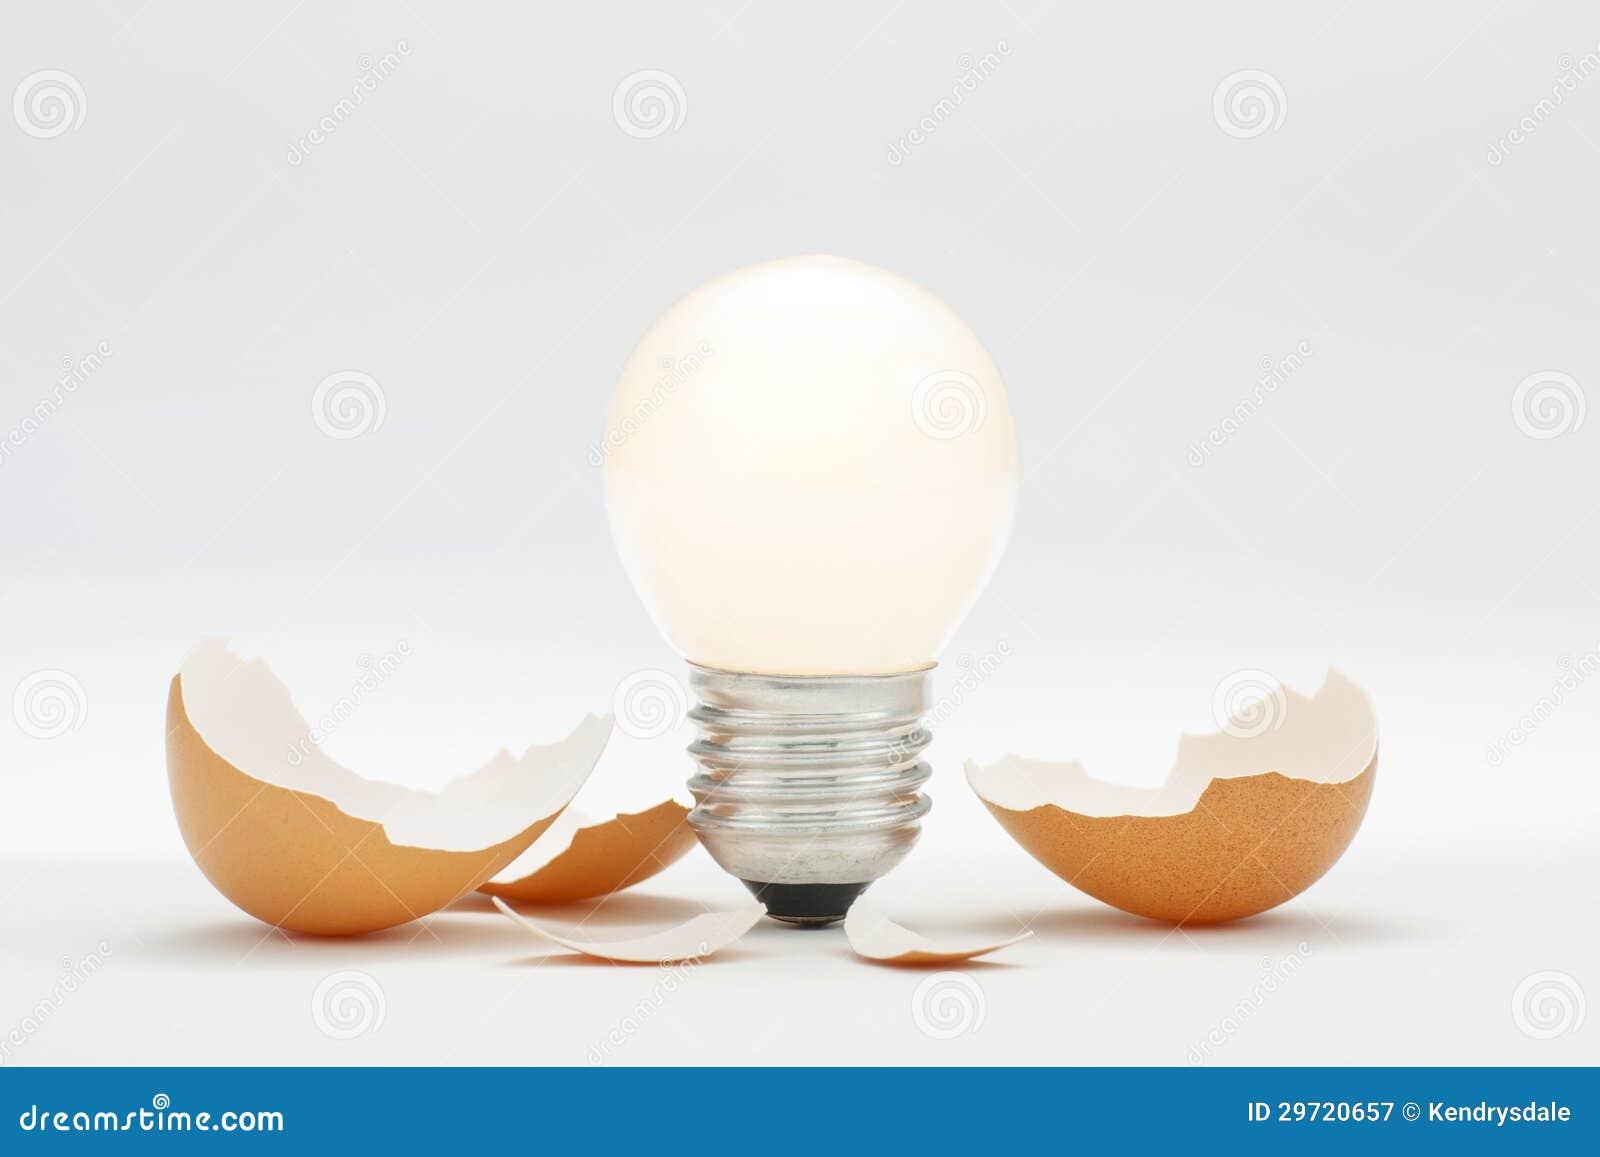 Bright New Innovation Idea Hatching Royalty Free Stock